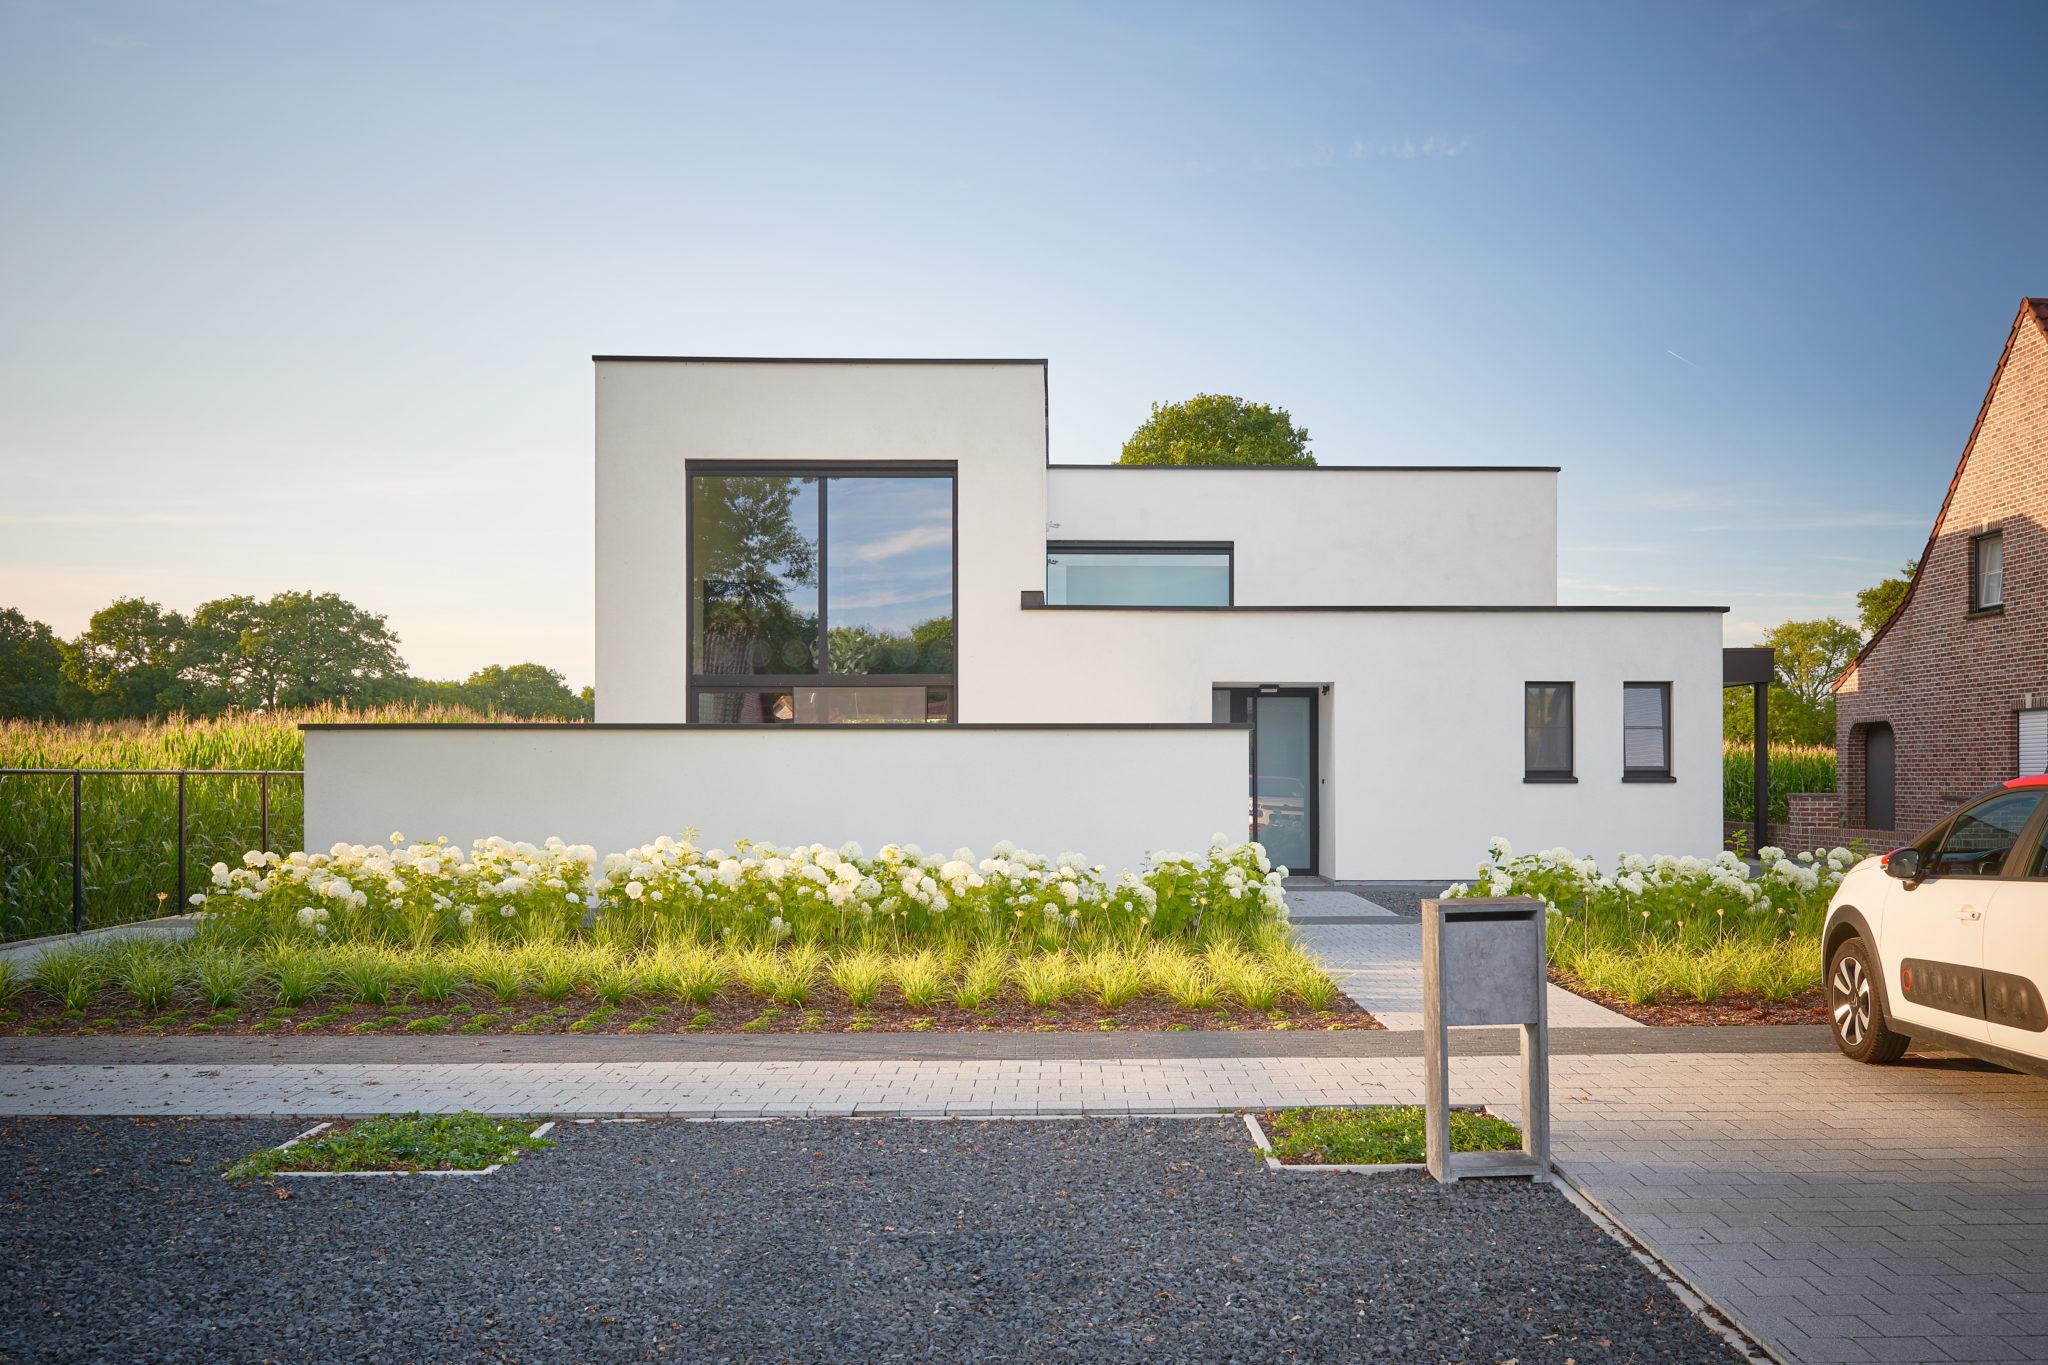 Beroemd moderne architectuur woningen px82 belbin info for Woningen moderne villa